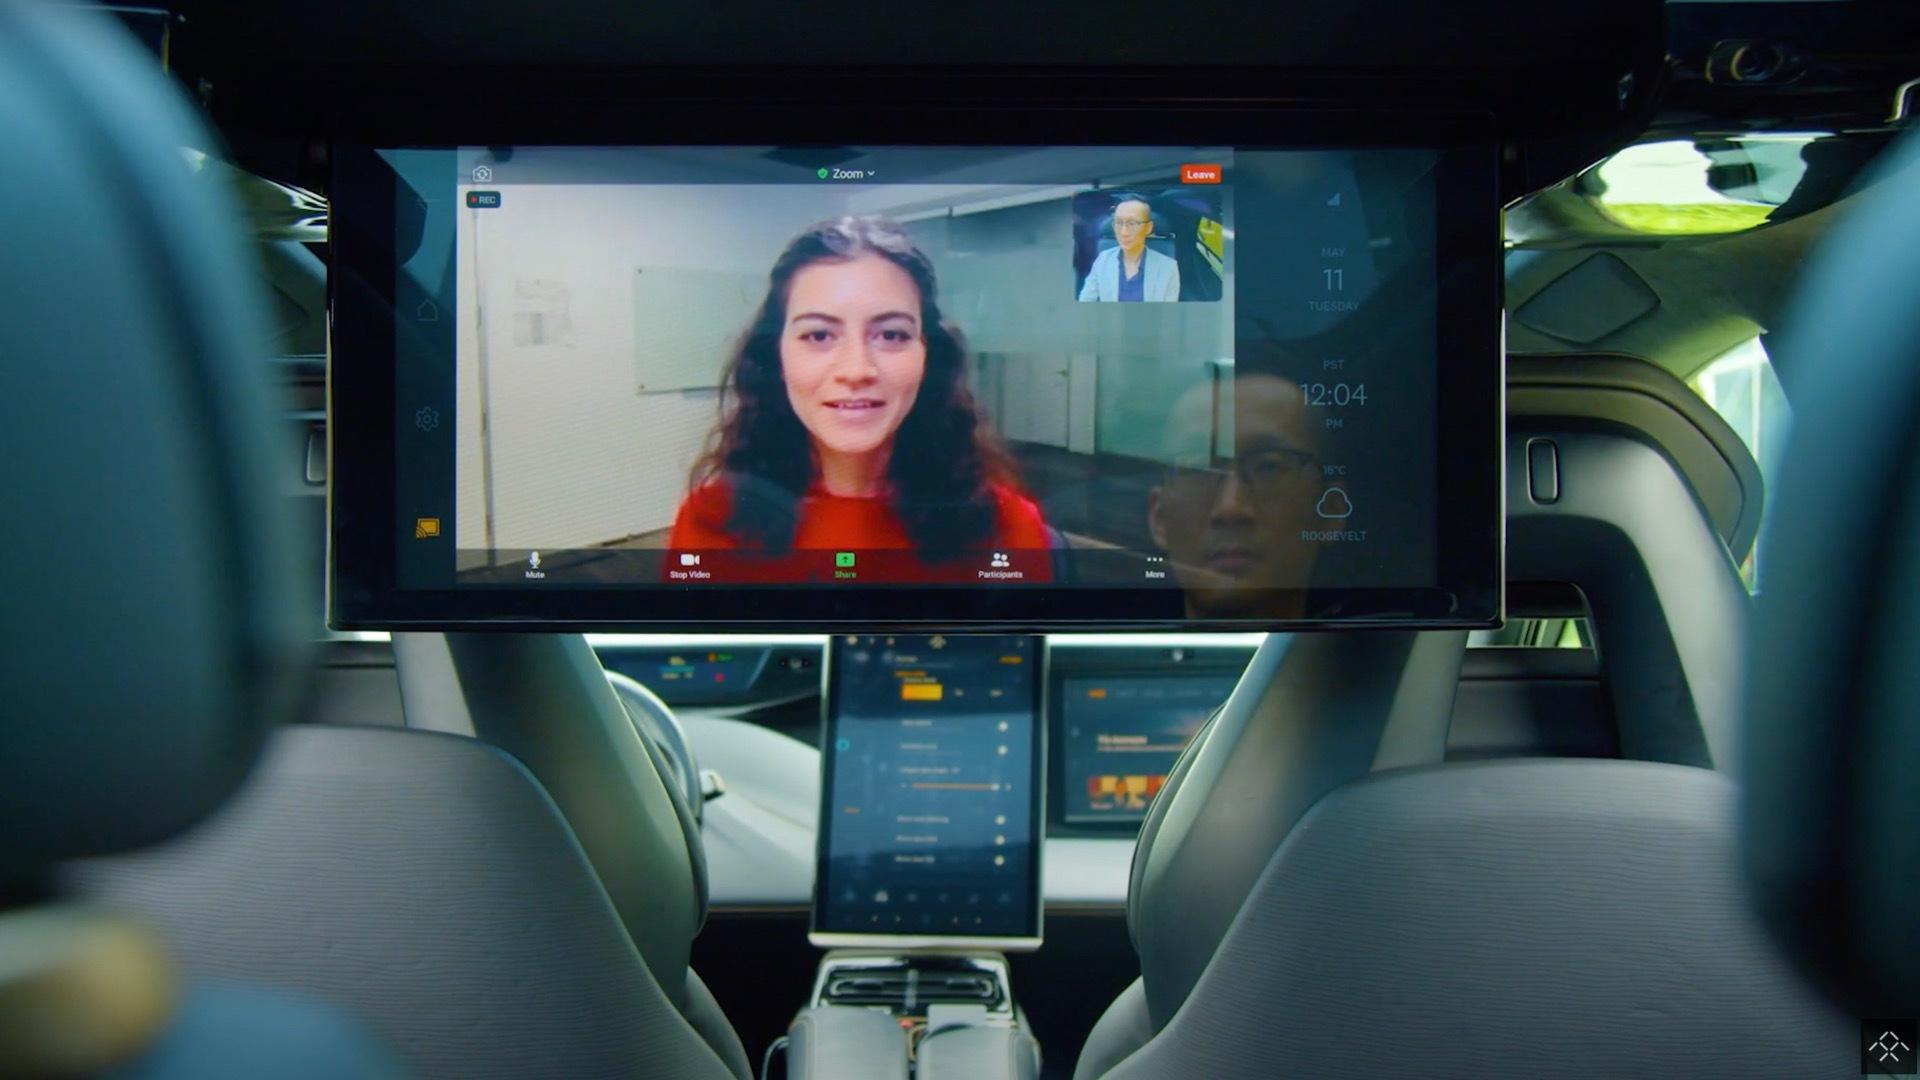 Faraday Future FF91 in-car videoconferencing